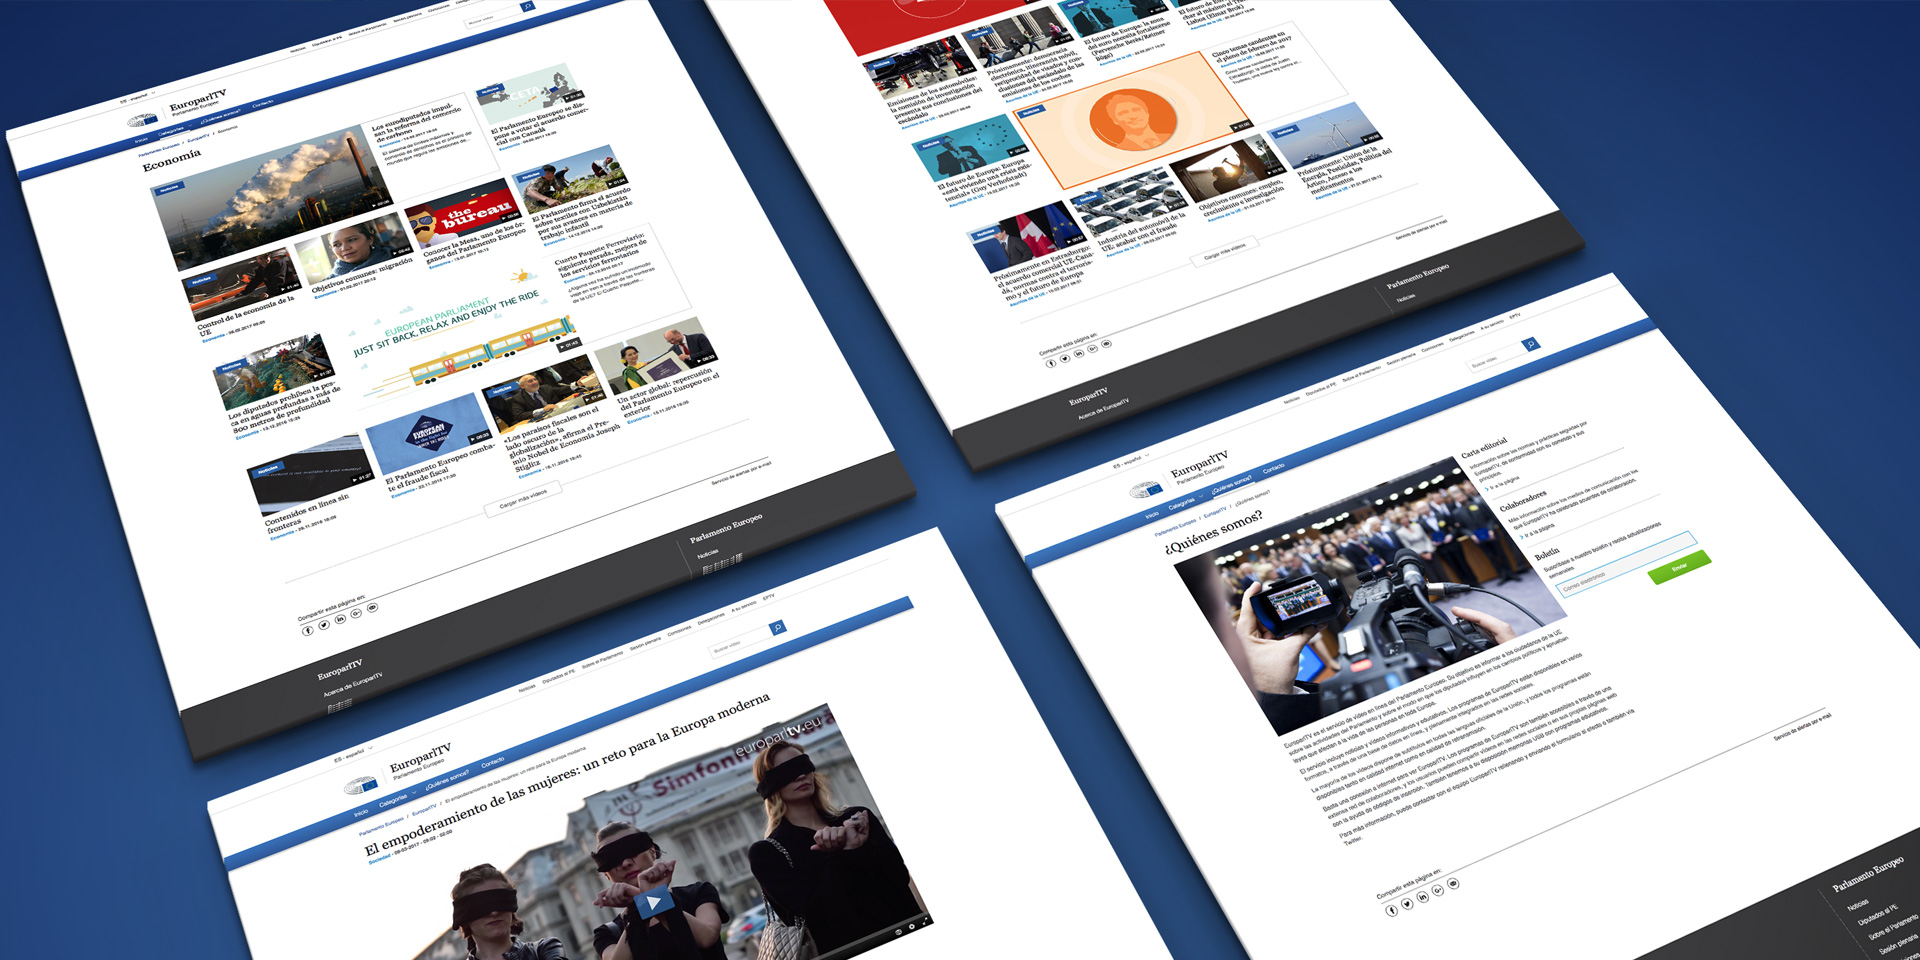 webTv European Parliament LaviniaNext